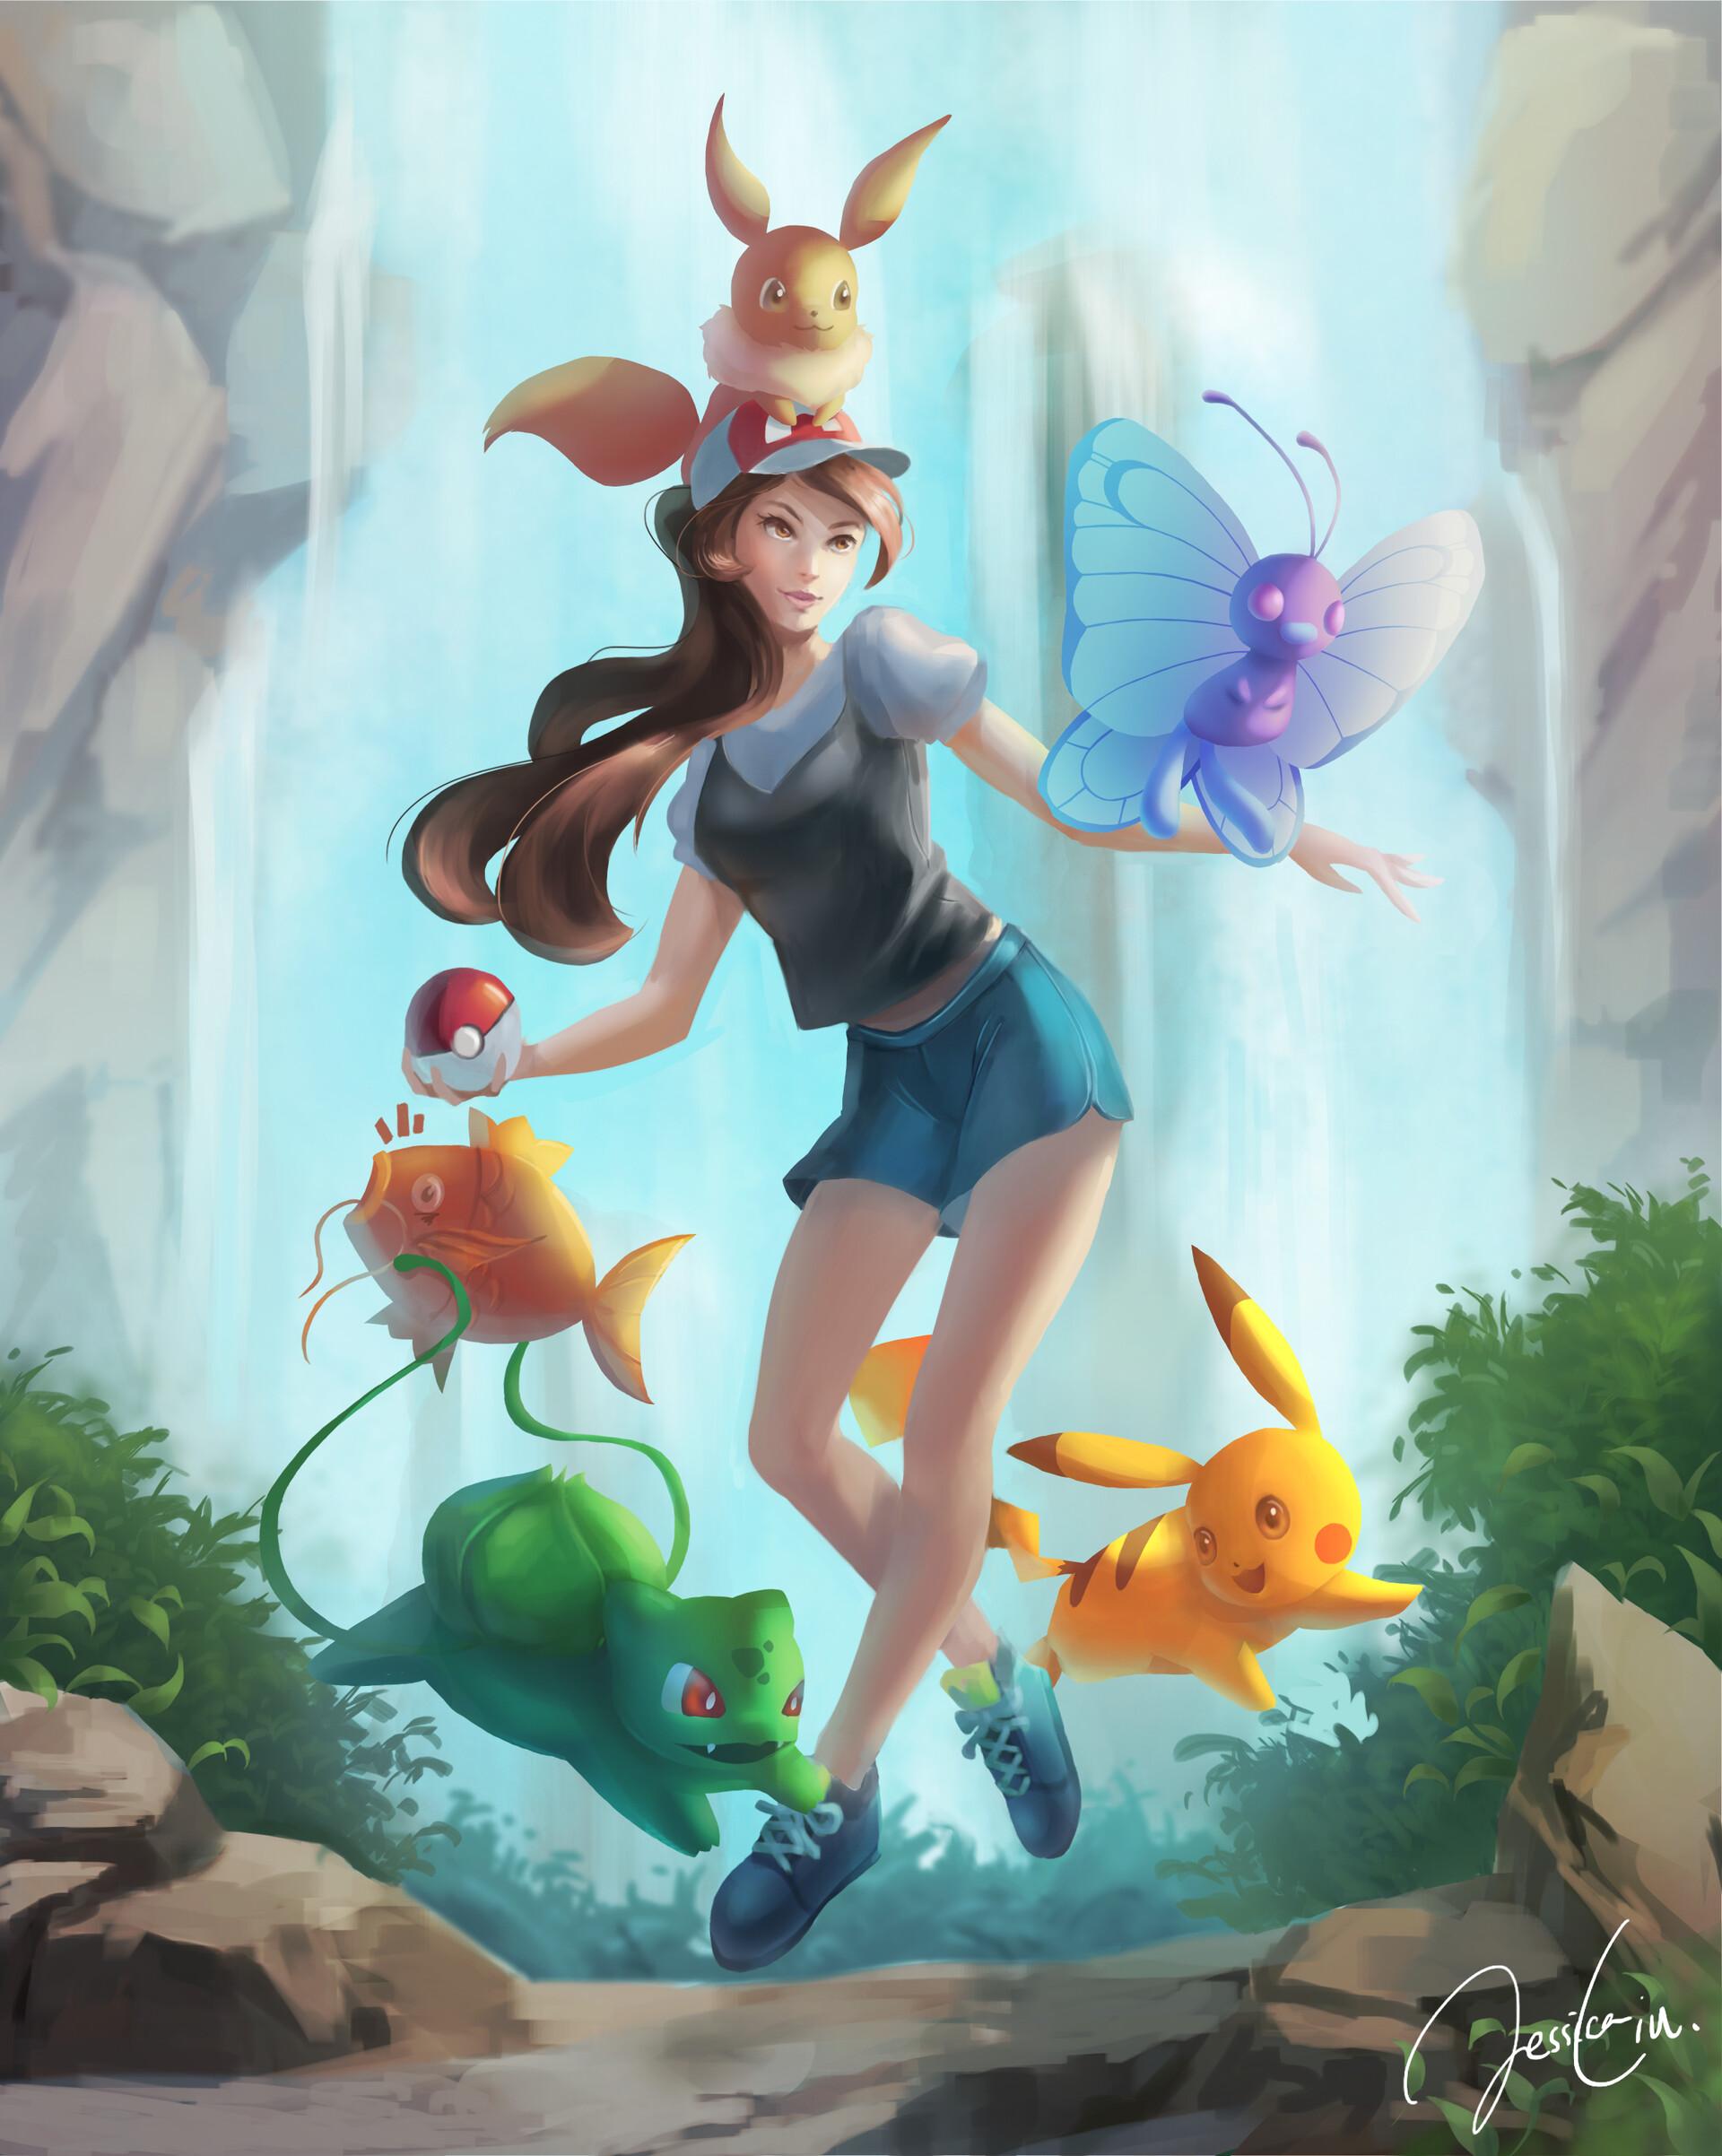 Jessica liu pokemonletsgo